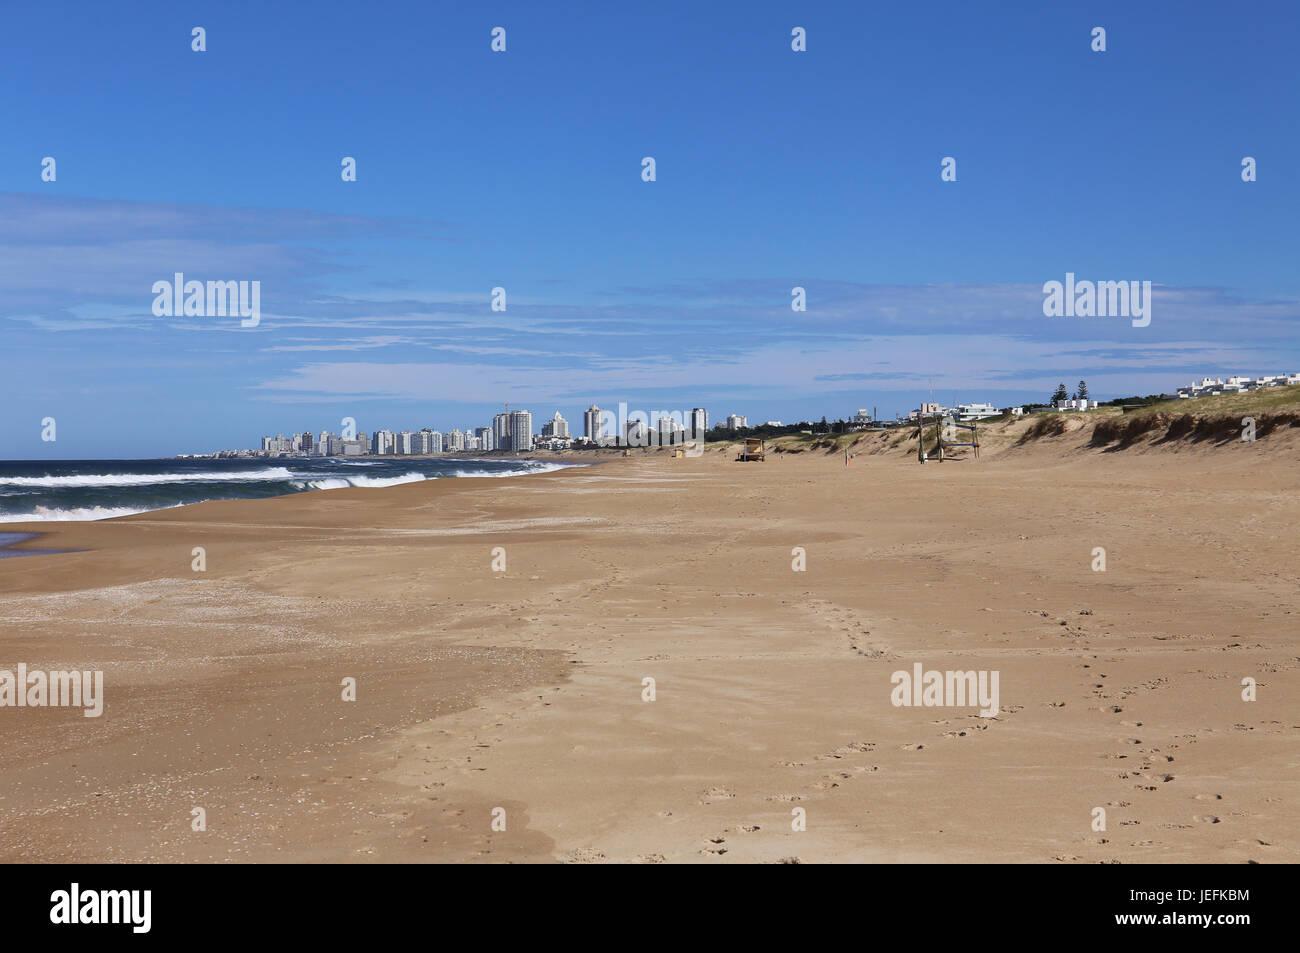 Beach in Front of Punta del Este, Uruguay April 2017 - Stock Image